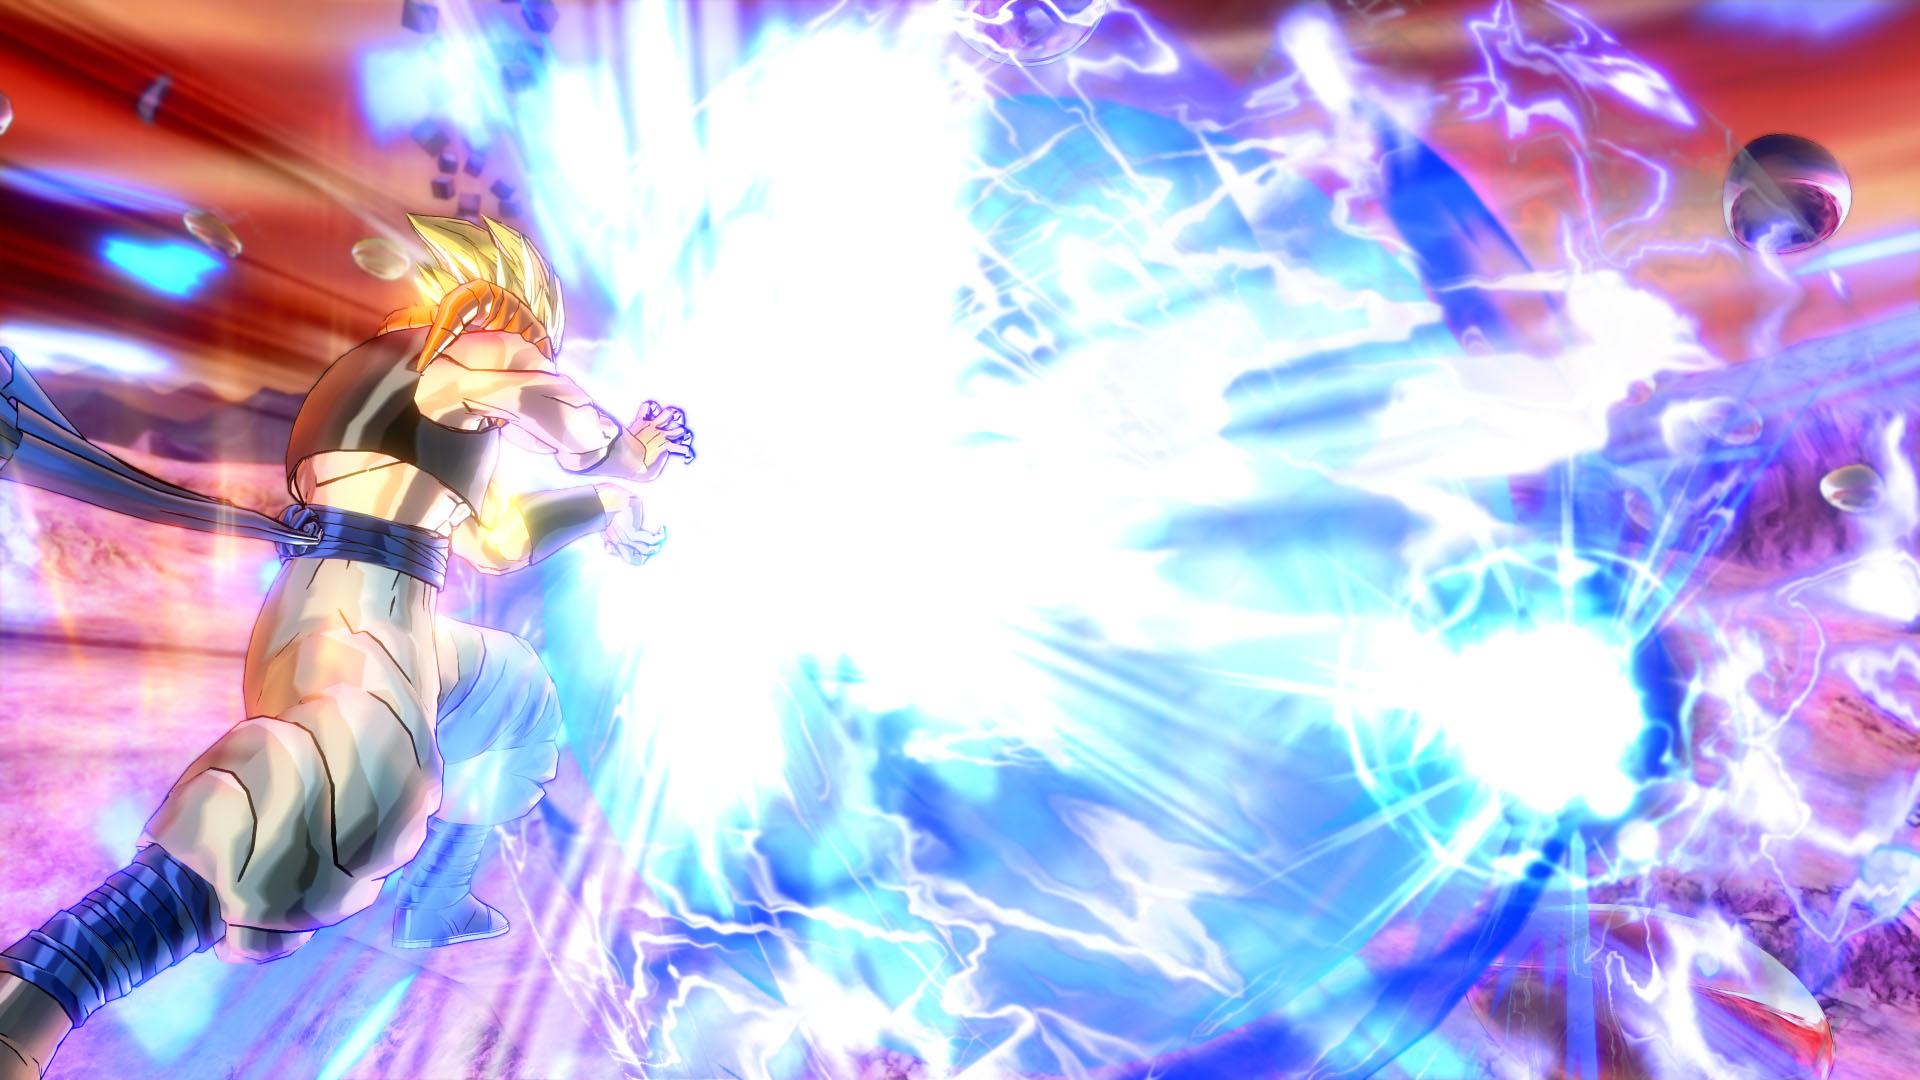 Dragon Ball Xenoverse 2 ESPAÑOL Descargar Full (CODEX) + REPACK 3 DVD5 (JPW) 5